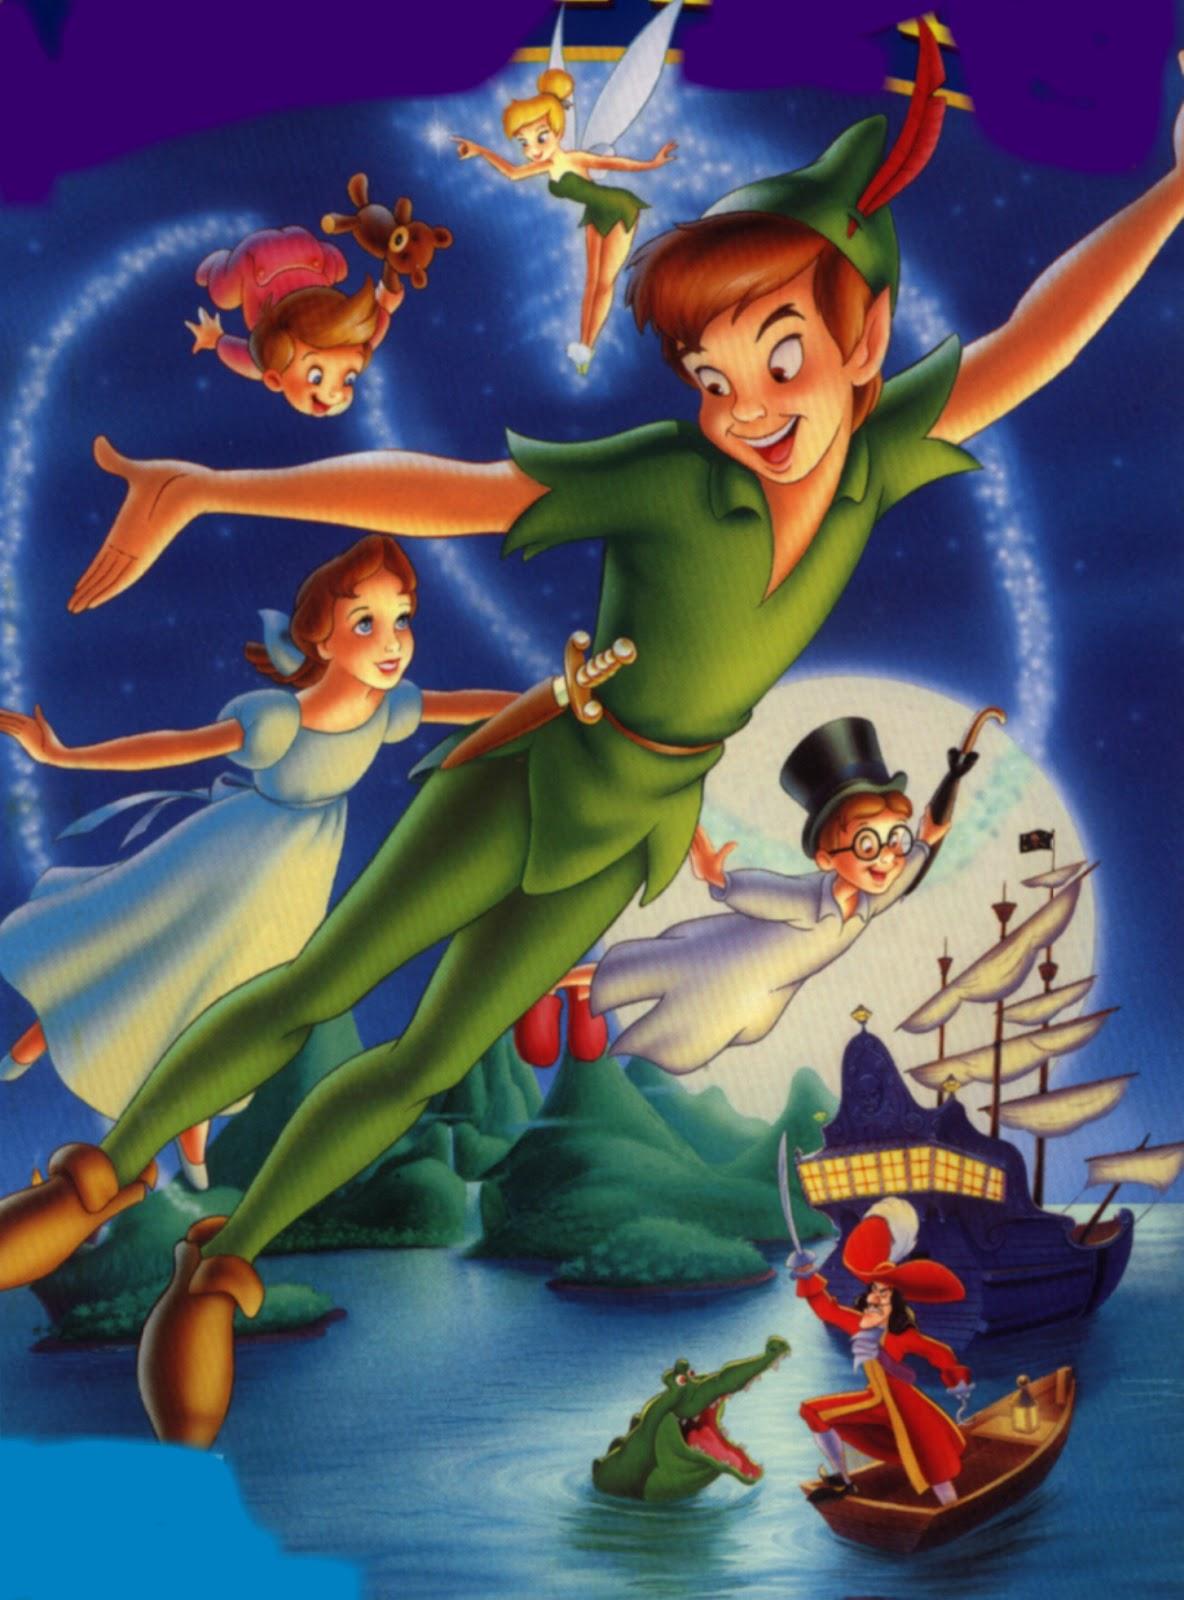 Peter Pan Bilder